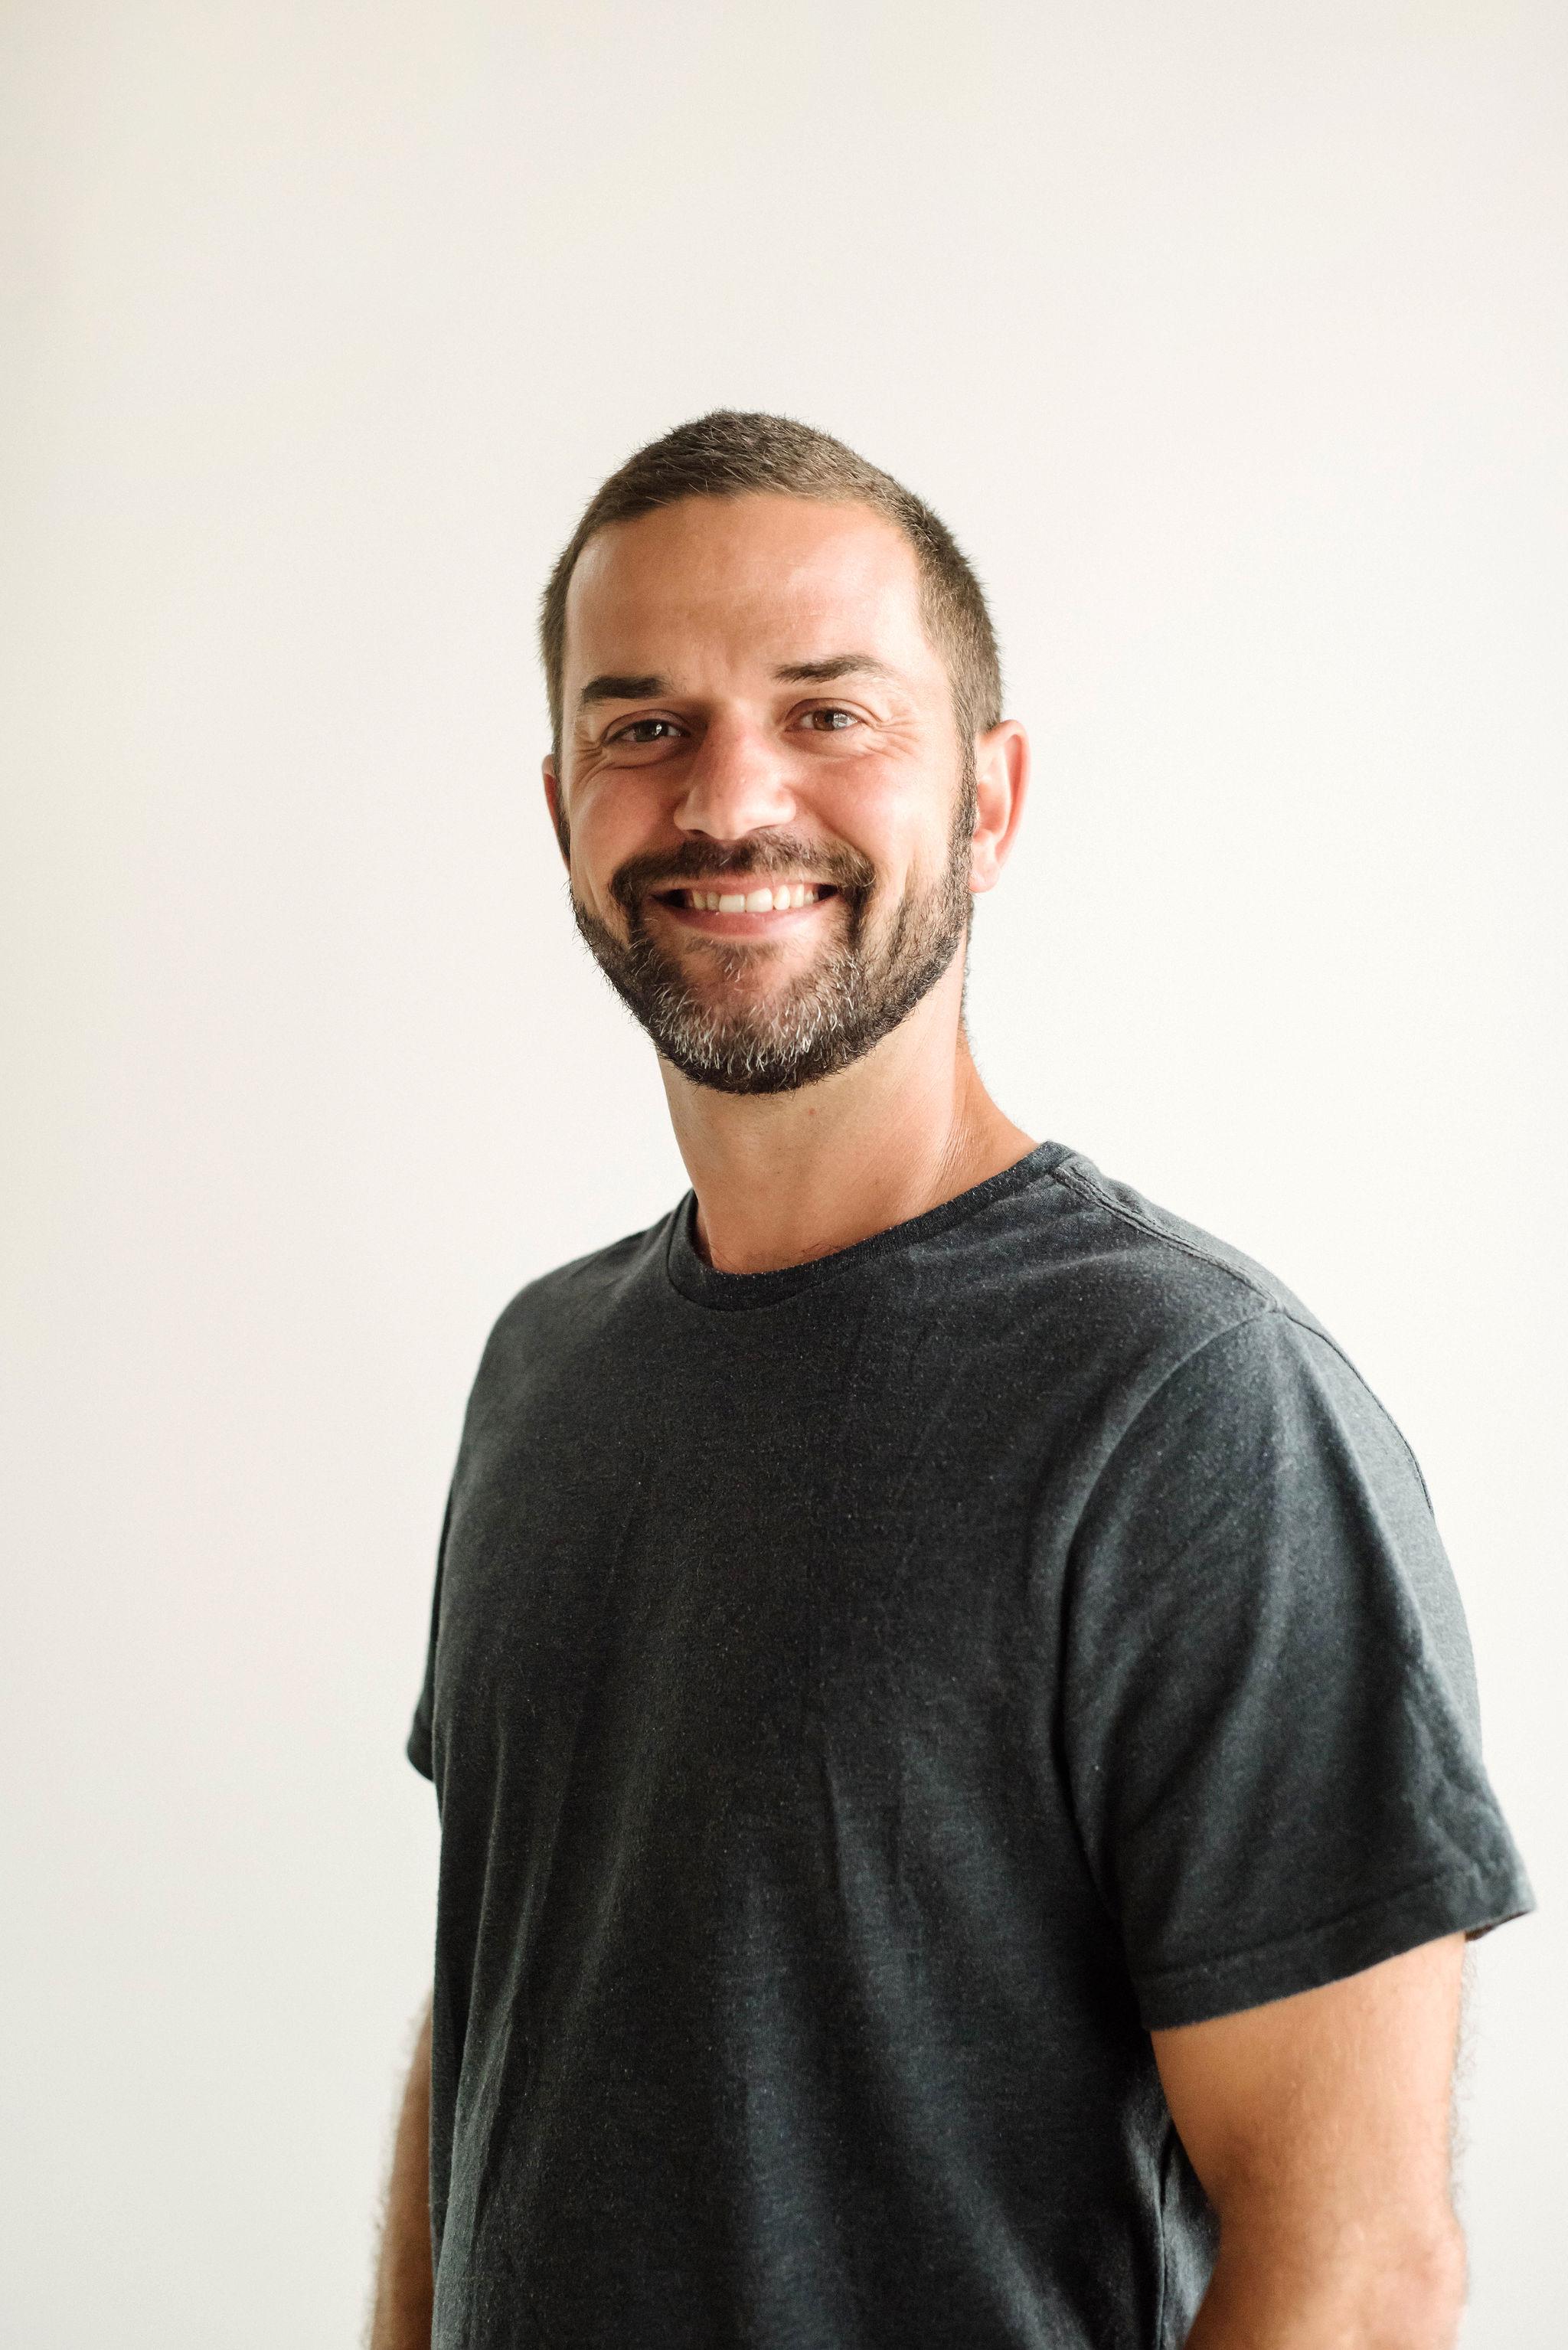 Matt Dolezal